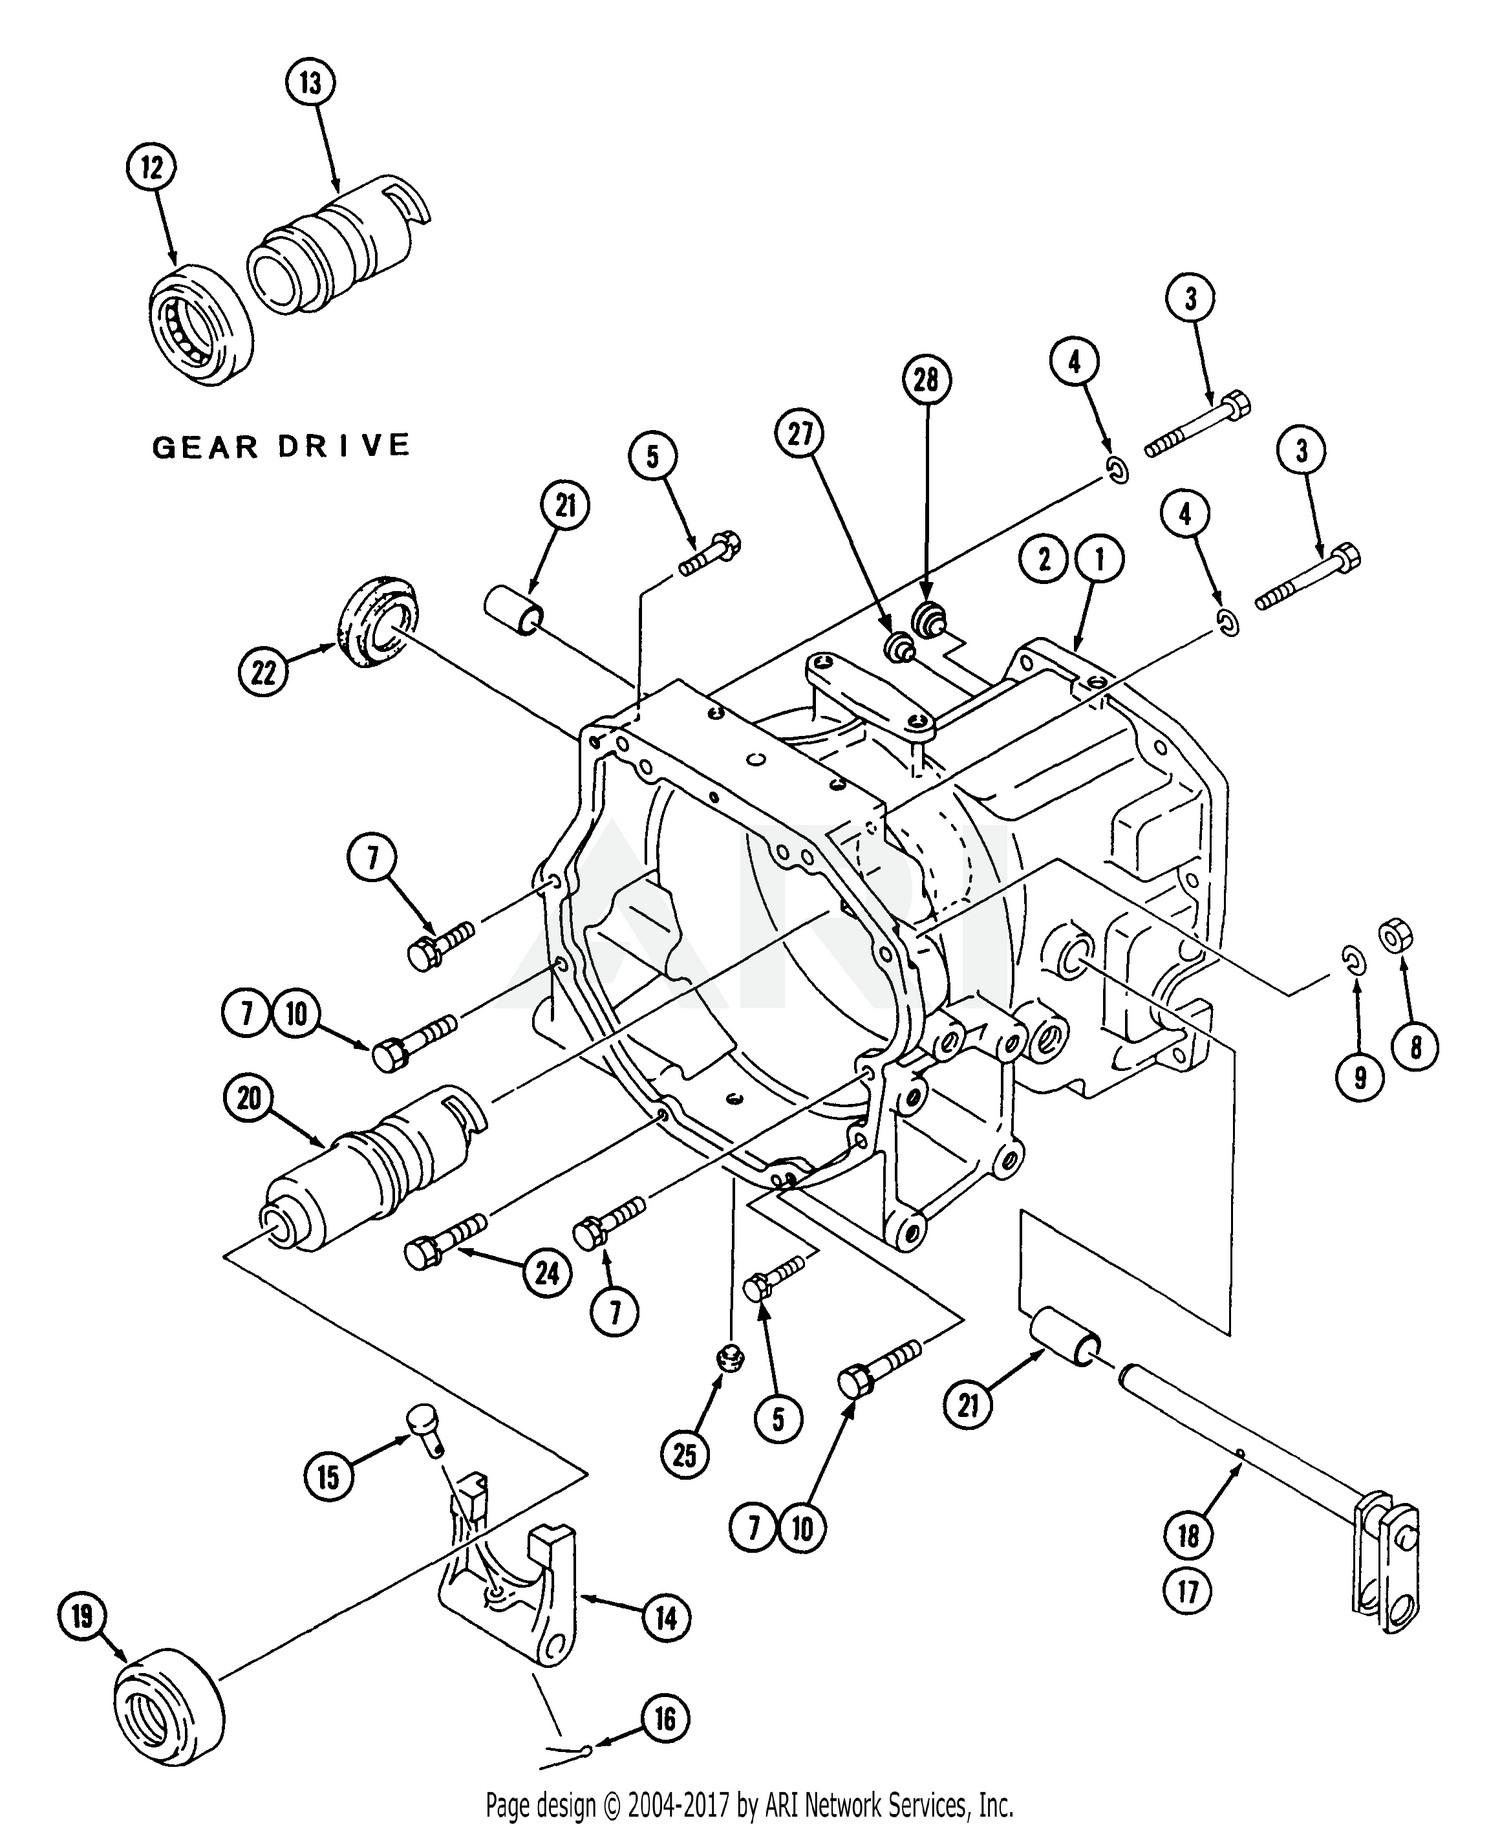 100 cub wiring diagram online wiring diagram Wiring Diagram for Ford Tractor jbl prv 175 wiring diagram wiring diagram database100 cub wiring diagram auto electrical wiring diagram krank